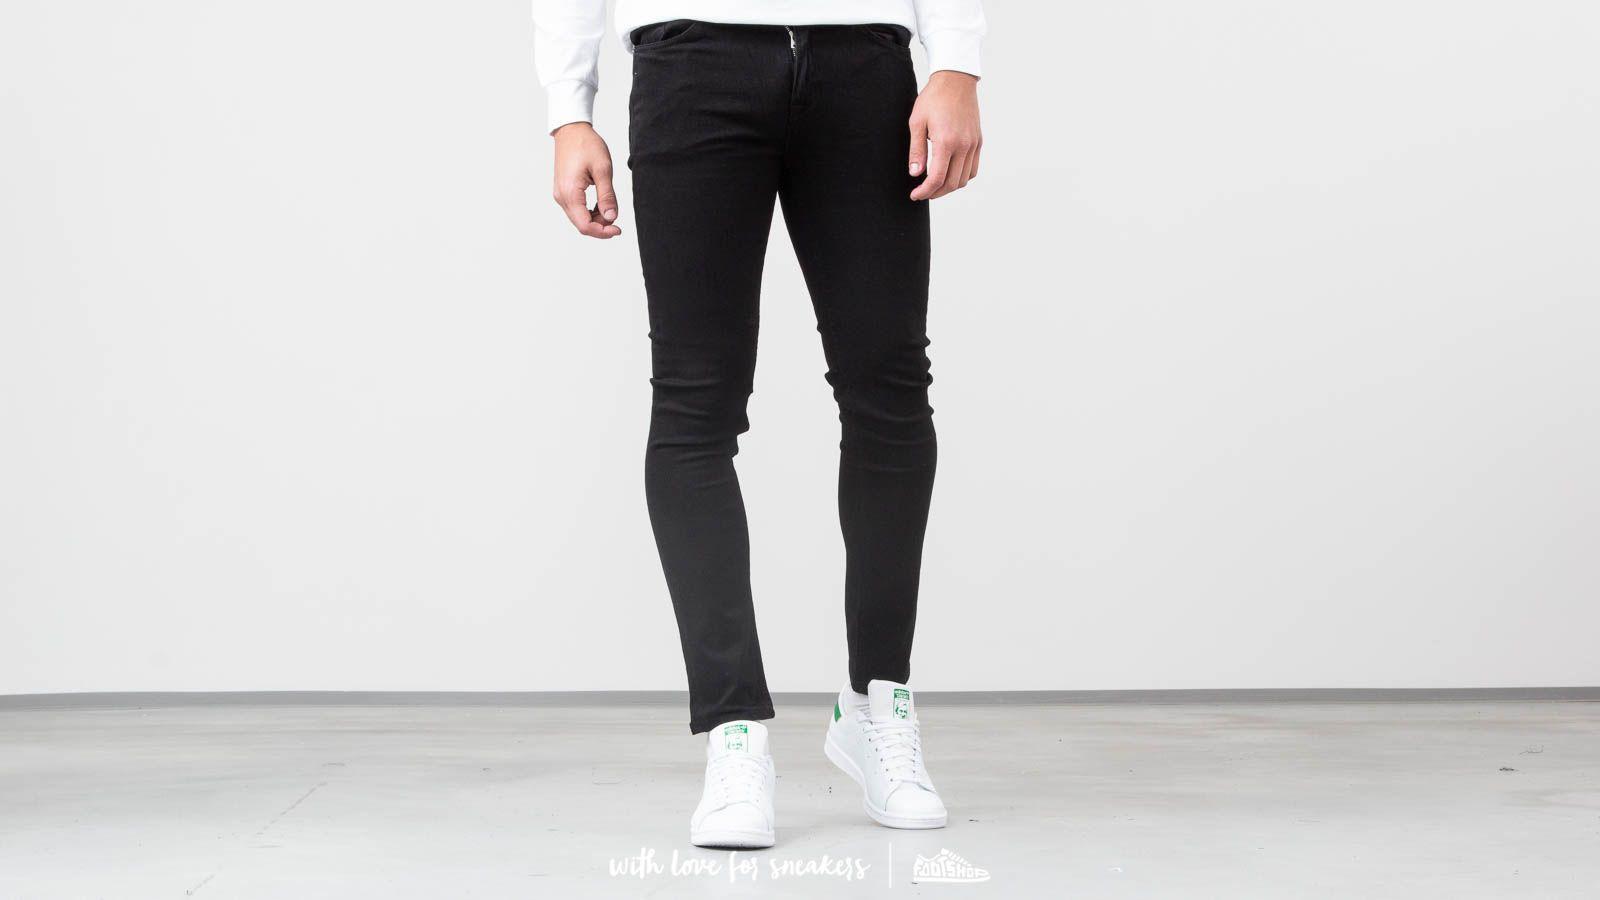 Junk de Luxe Dennis Jeans Black za skvelú cenu 46 € kúpite na Footshop.sk